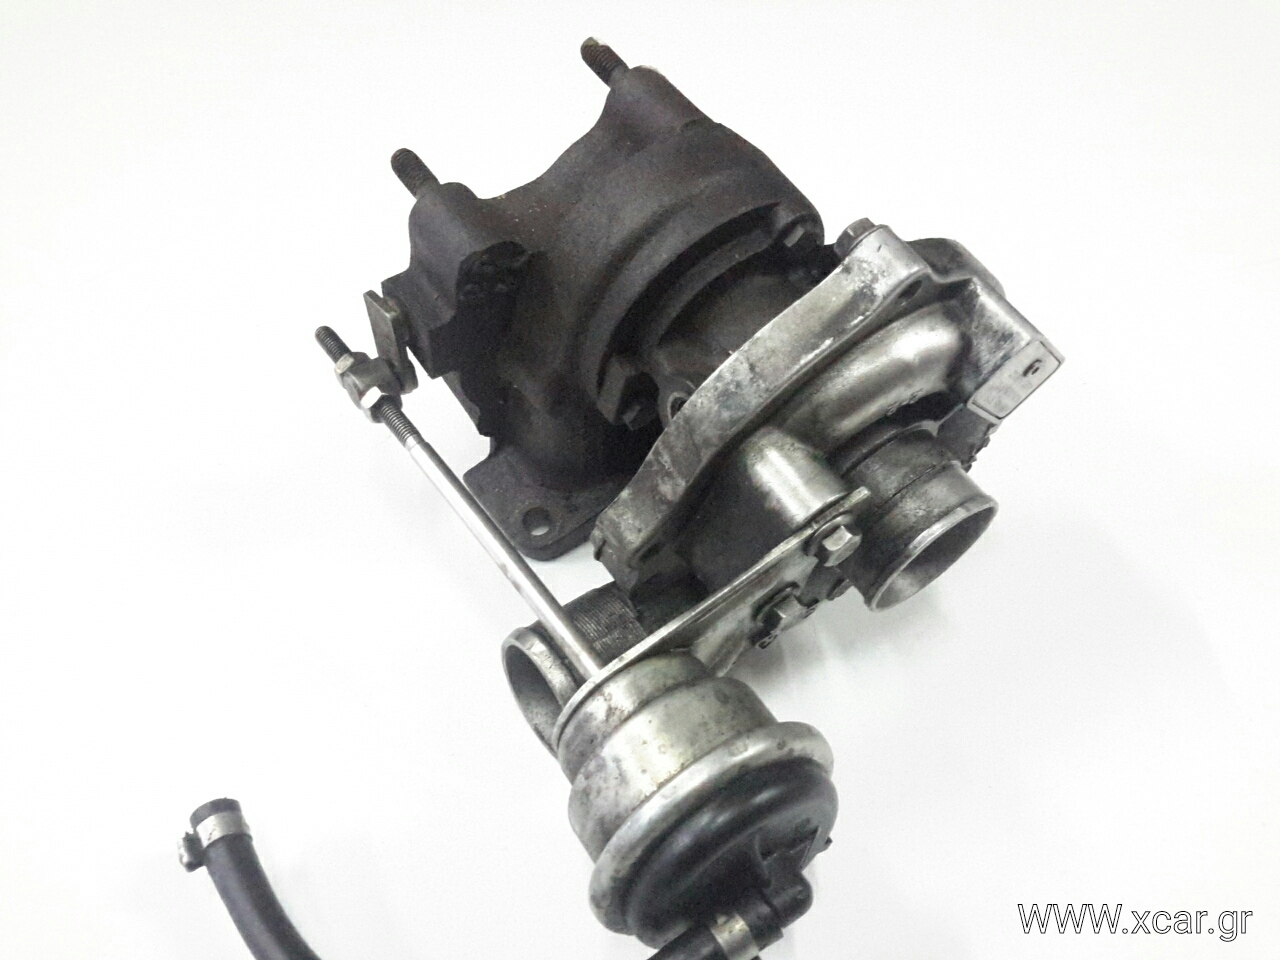 Turbo-Τουρμπίνα RENAULT KANGOO MPV / ΠΟΛΥΜΟΡΦΙΚΑ / 5dr 2003 - 2008 ( KC  } 1500 (K9K704 } Diesel 57 dCi #22735H33771